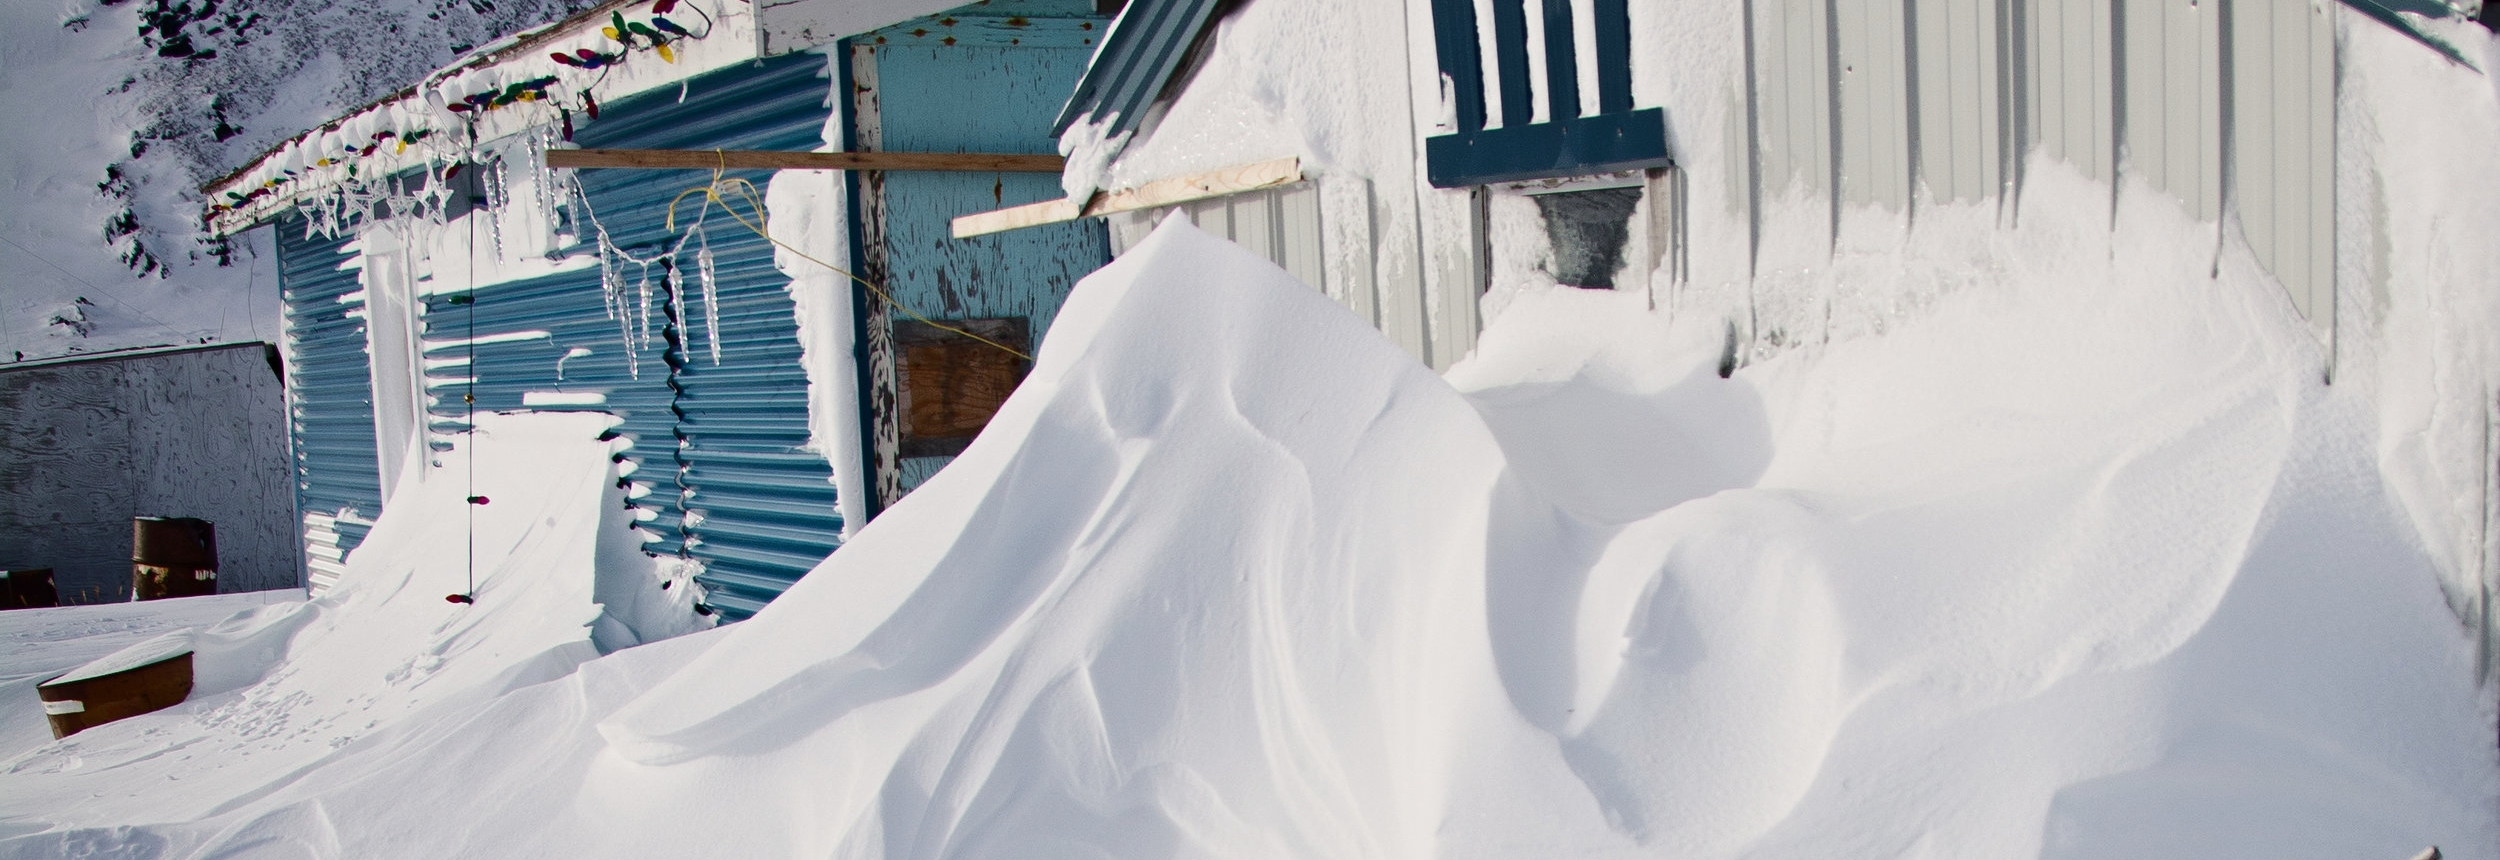 Eva Wu snow (1).jpg